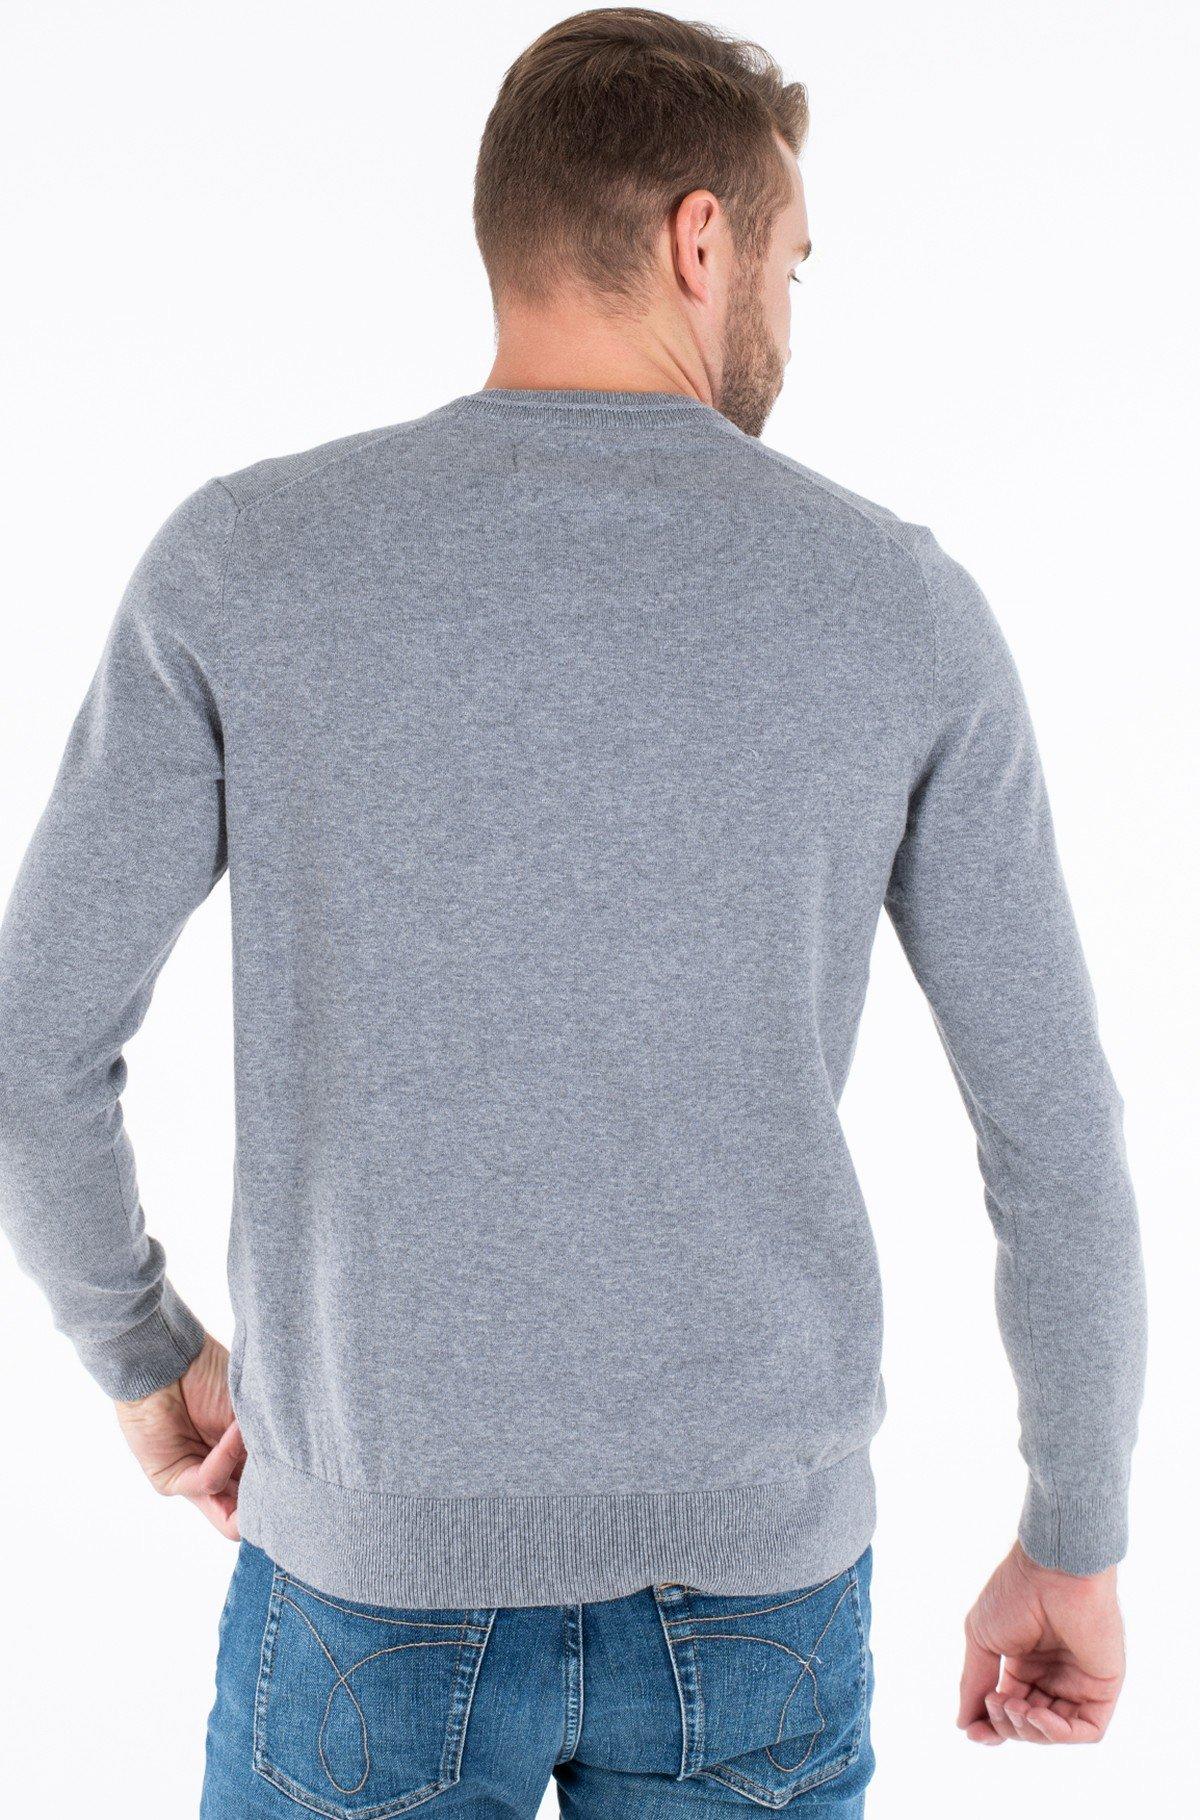 Sweater ESSENTIAL V NECK SWEATER-full-2